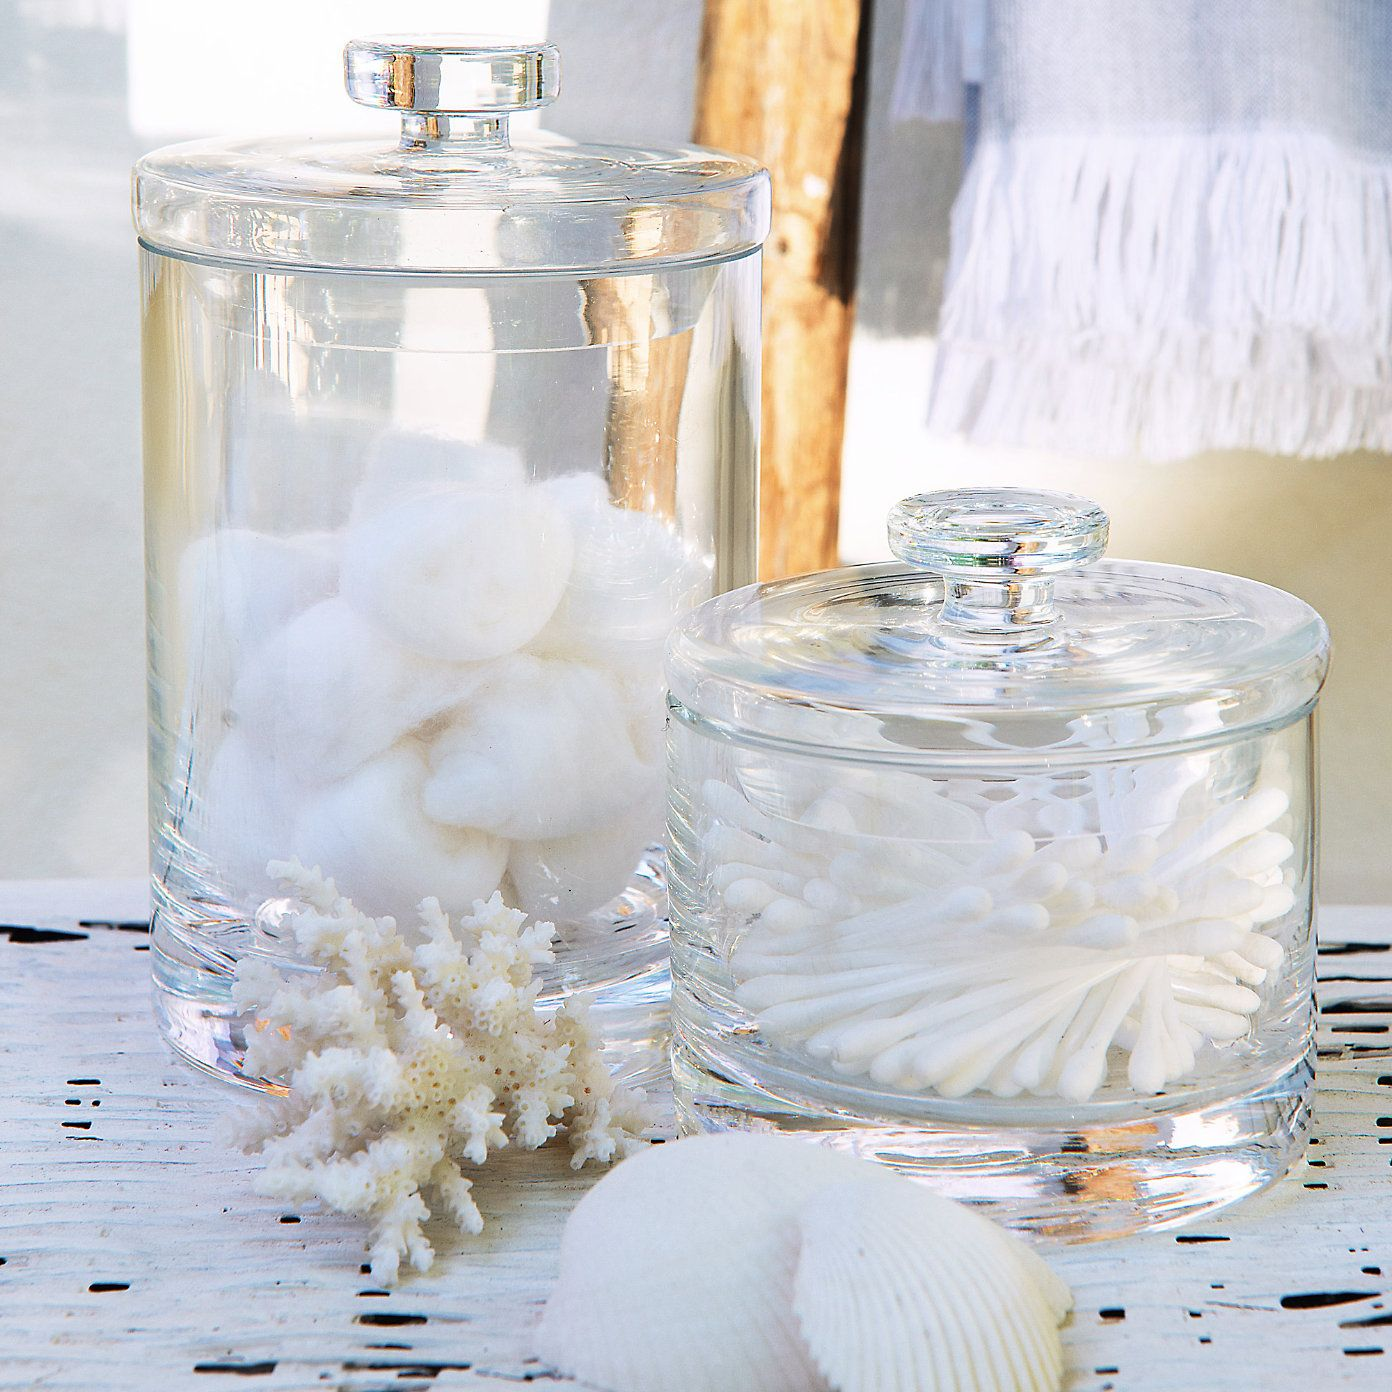 Buy Bathroom Bathroom Accessories Glass Storage Jars From The